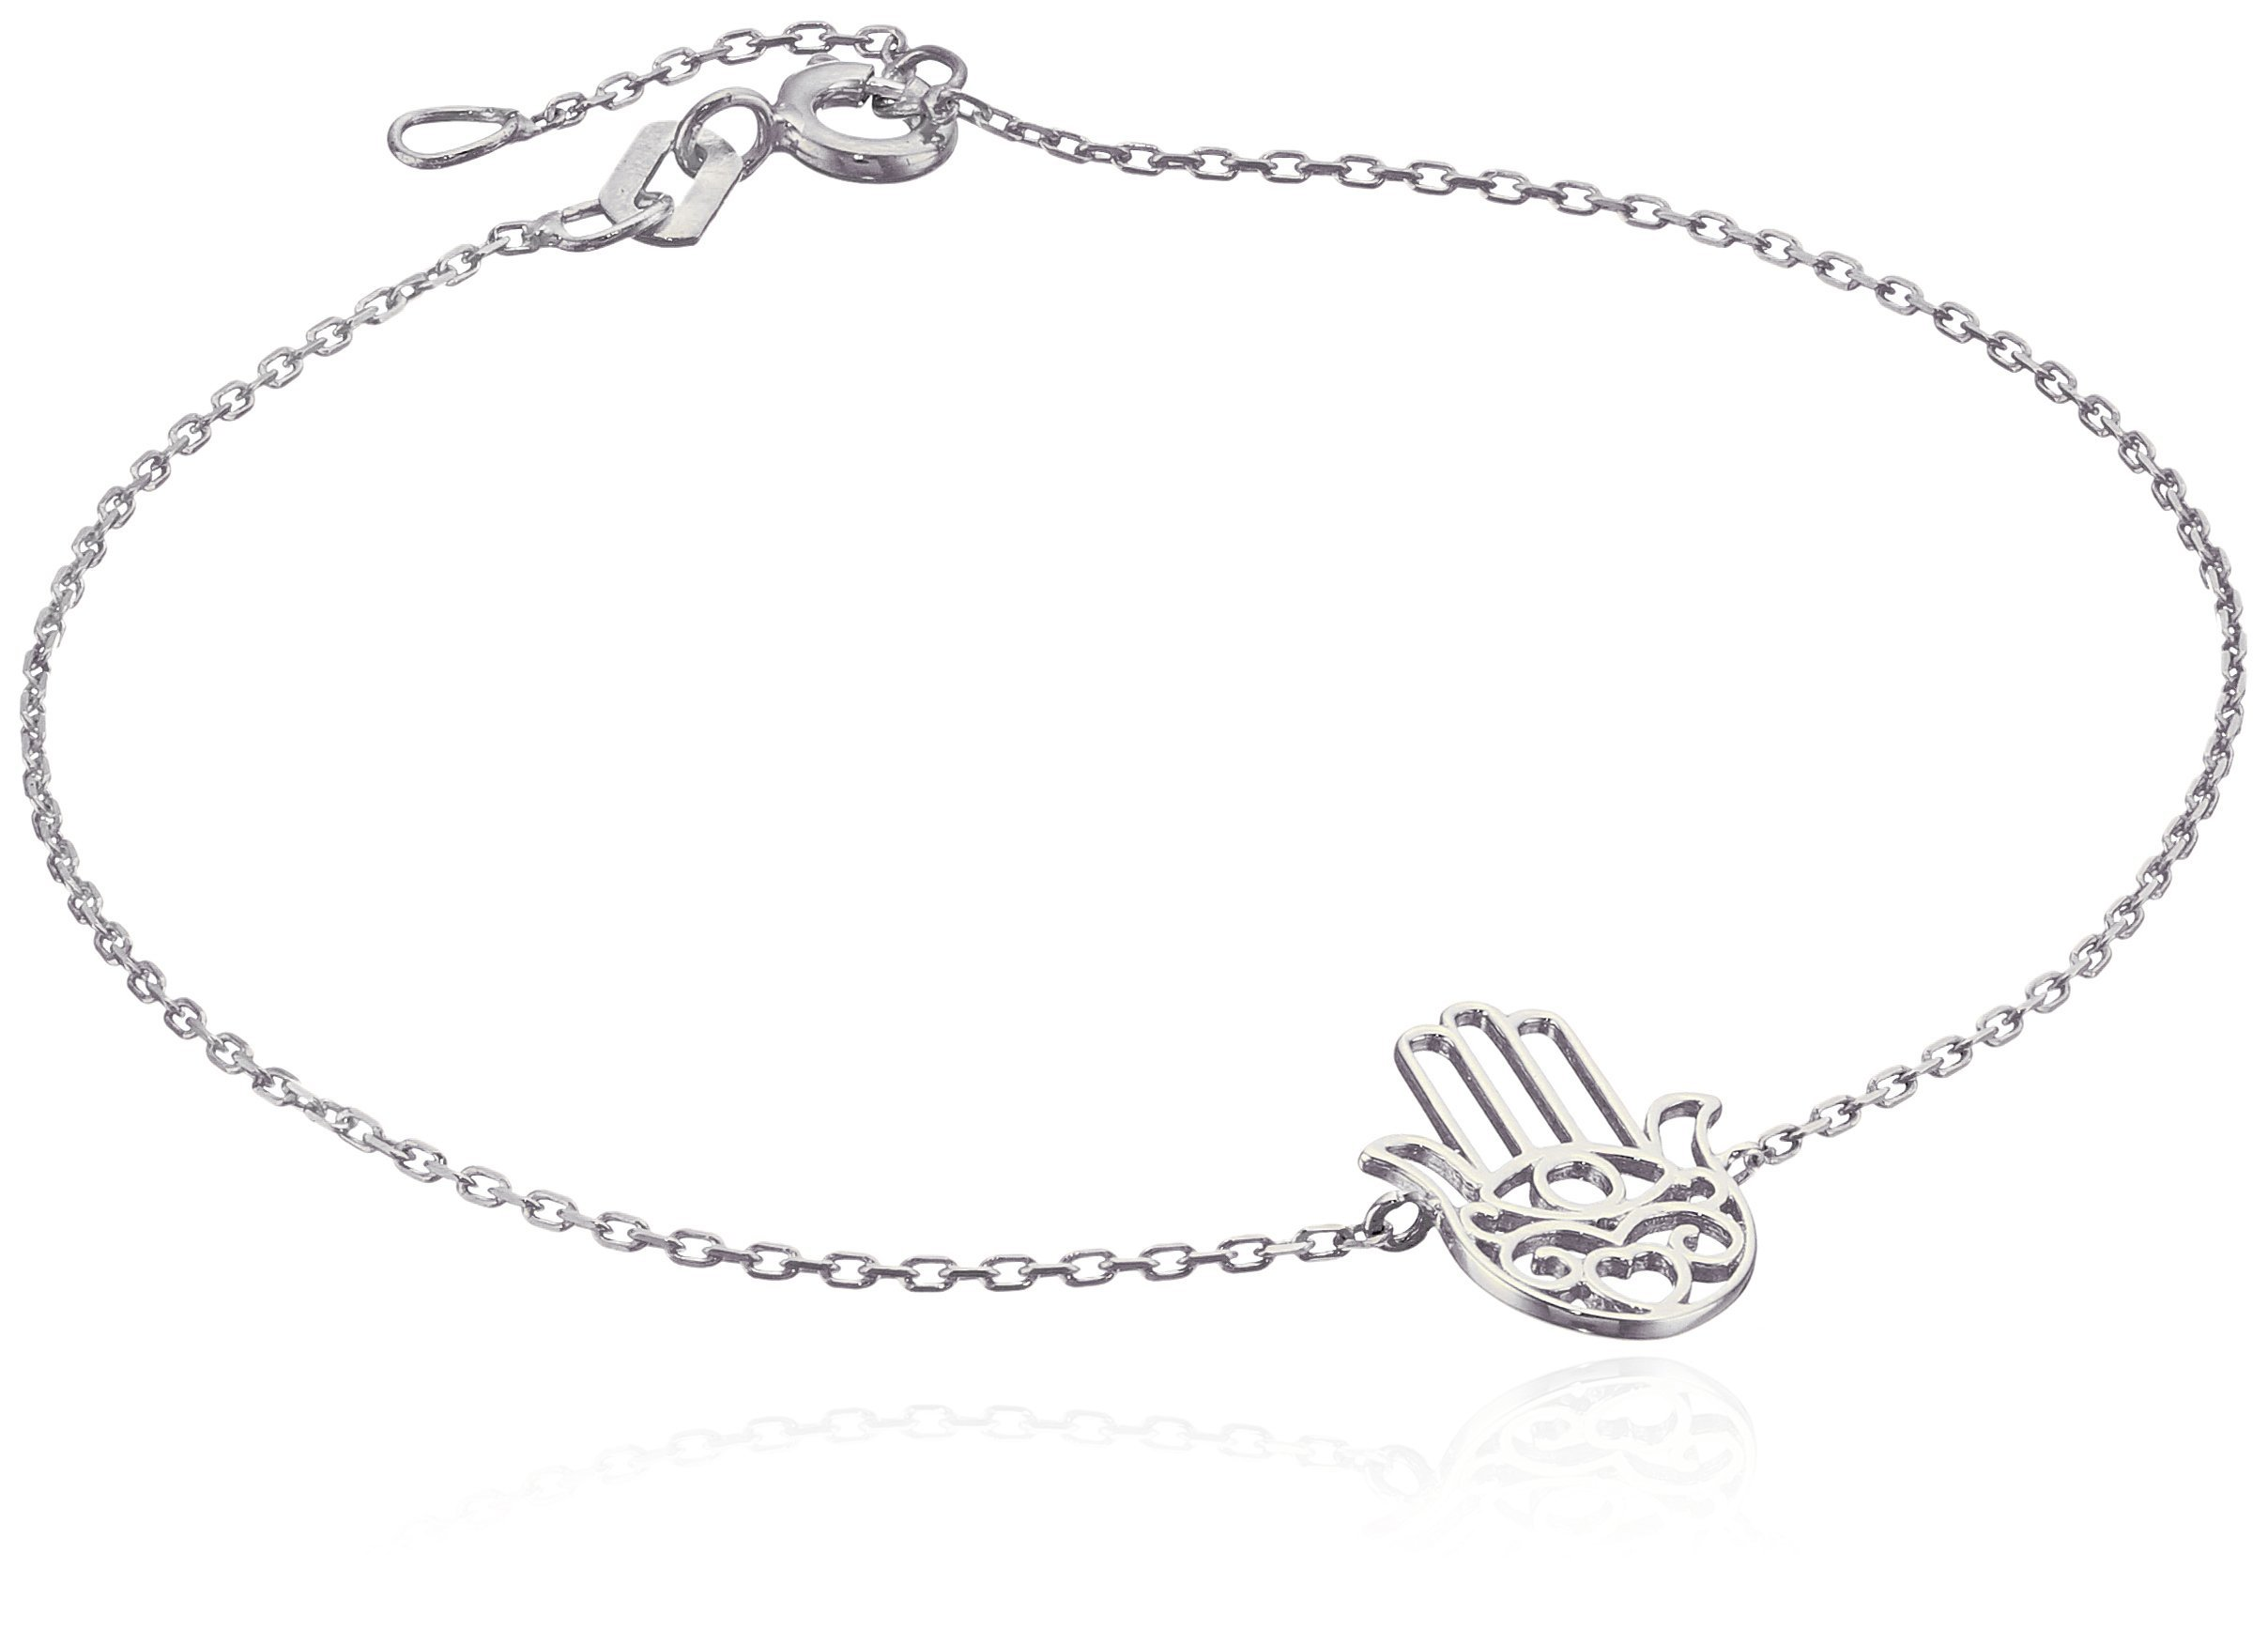 14k Italian White Gold Hamsa Adjustable Link Bracelet, 7-7.5''